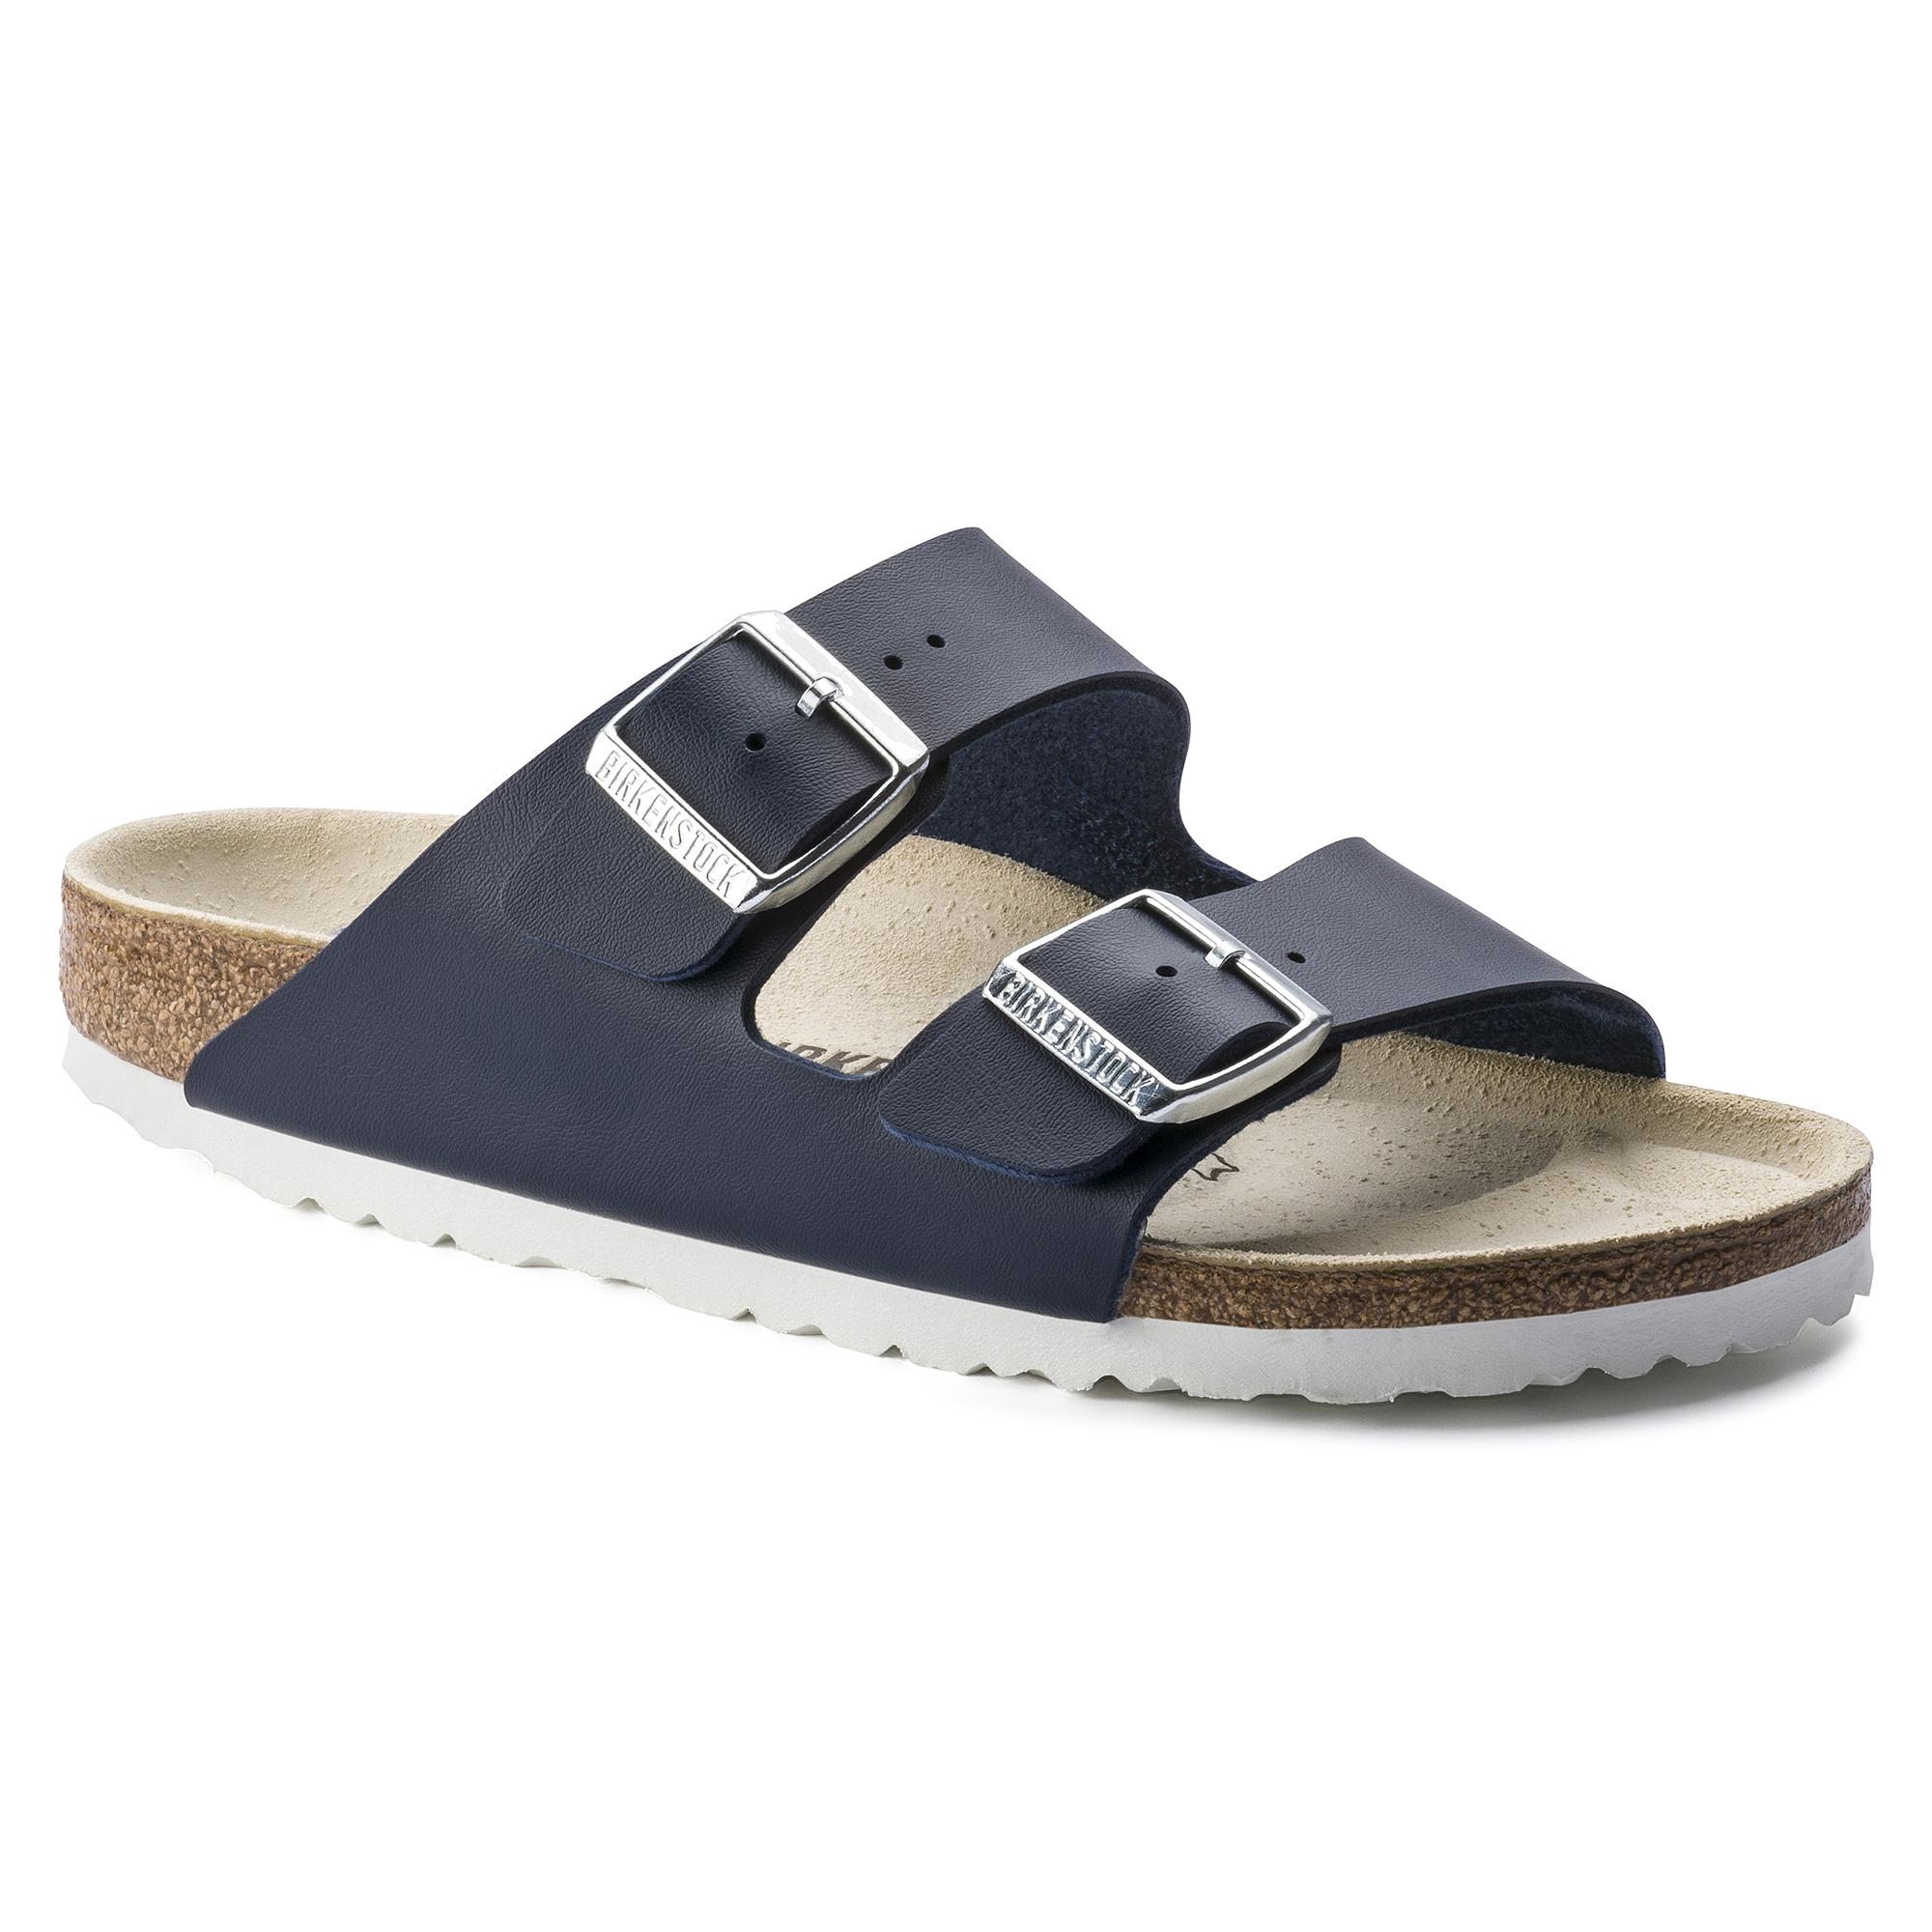 c19c4f71224c Arizona Birko-Flor Blue White